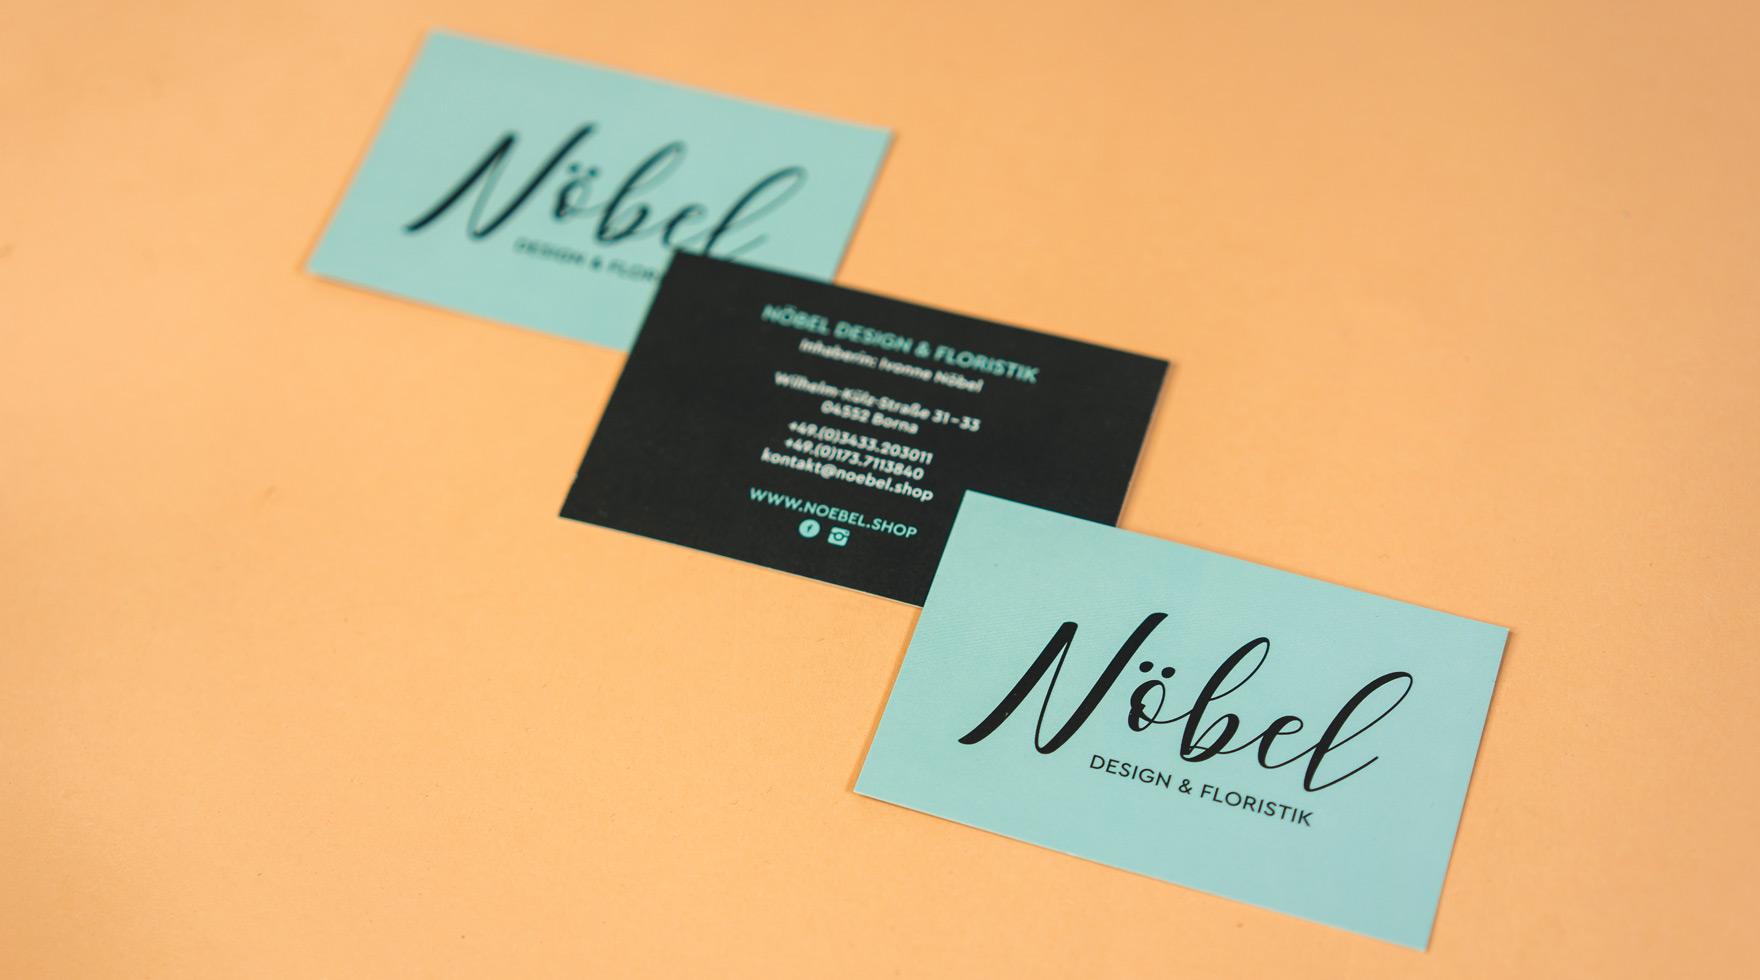 grafikdesign-noebel-webshop-leipzig